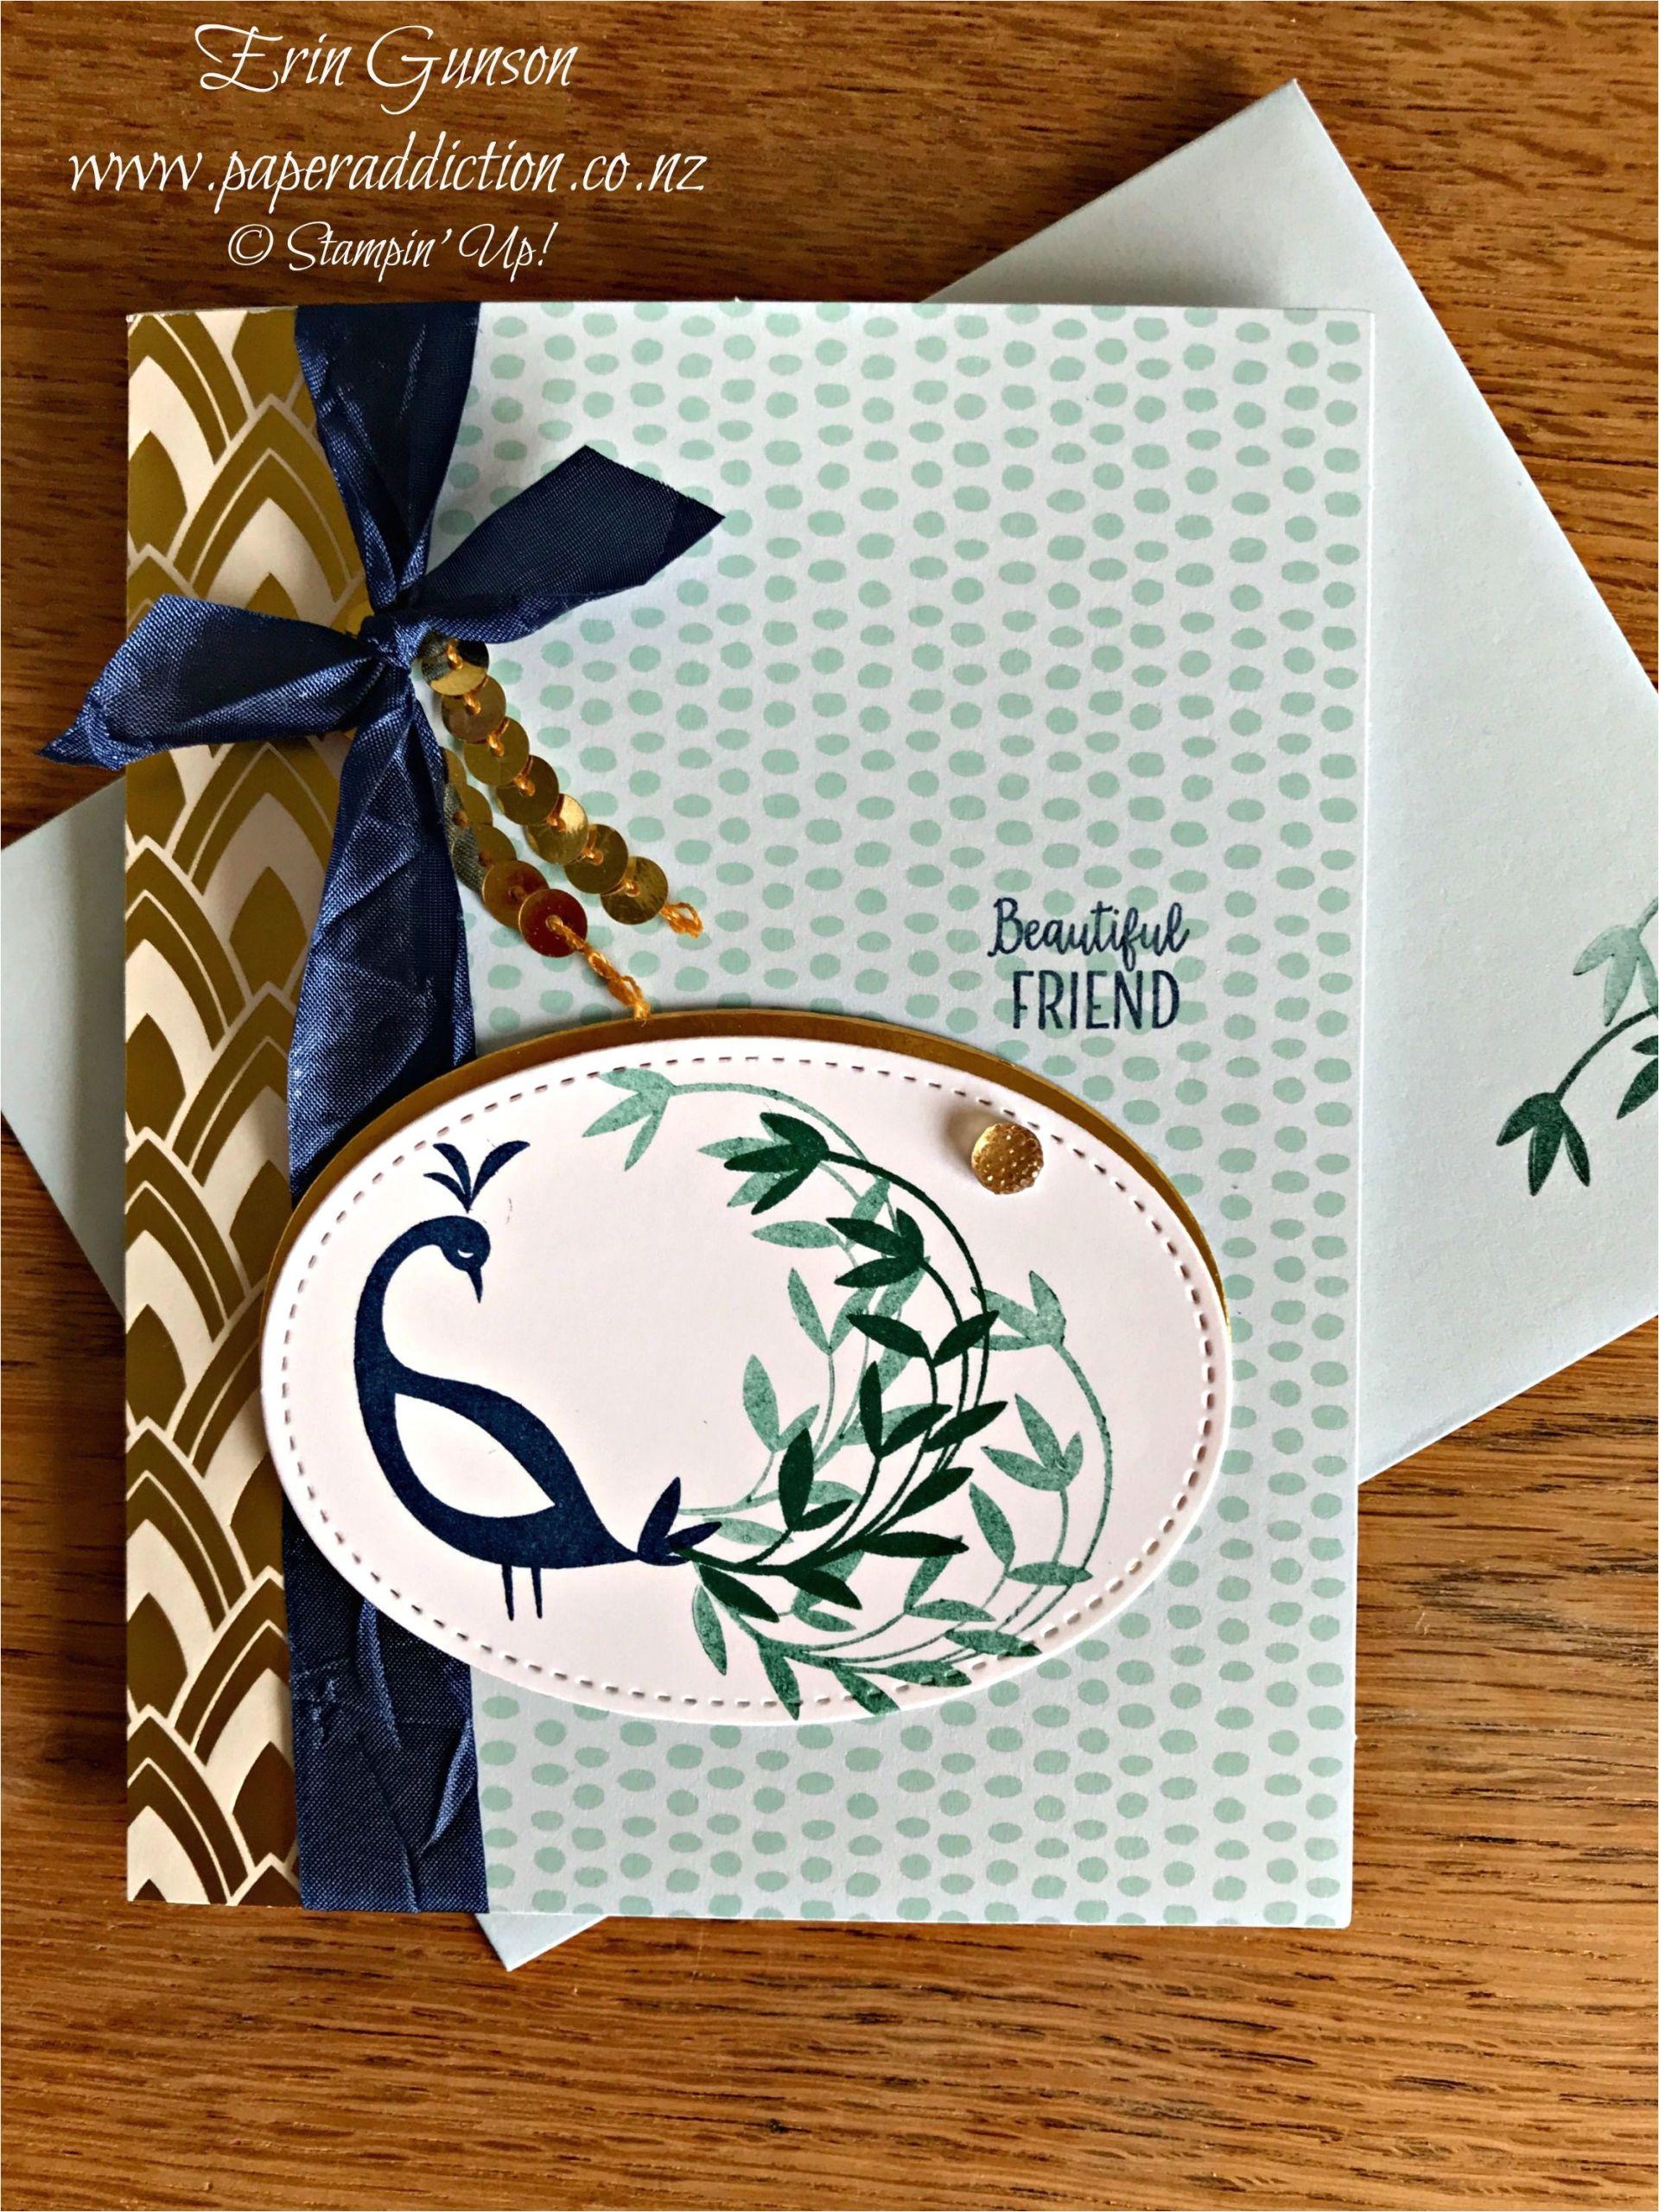 Stampin Up Beautiful Peacock Card Ideas Stampin Up Beautiful Peacock and Tutti Frutti Card Base